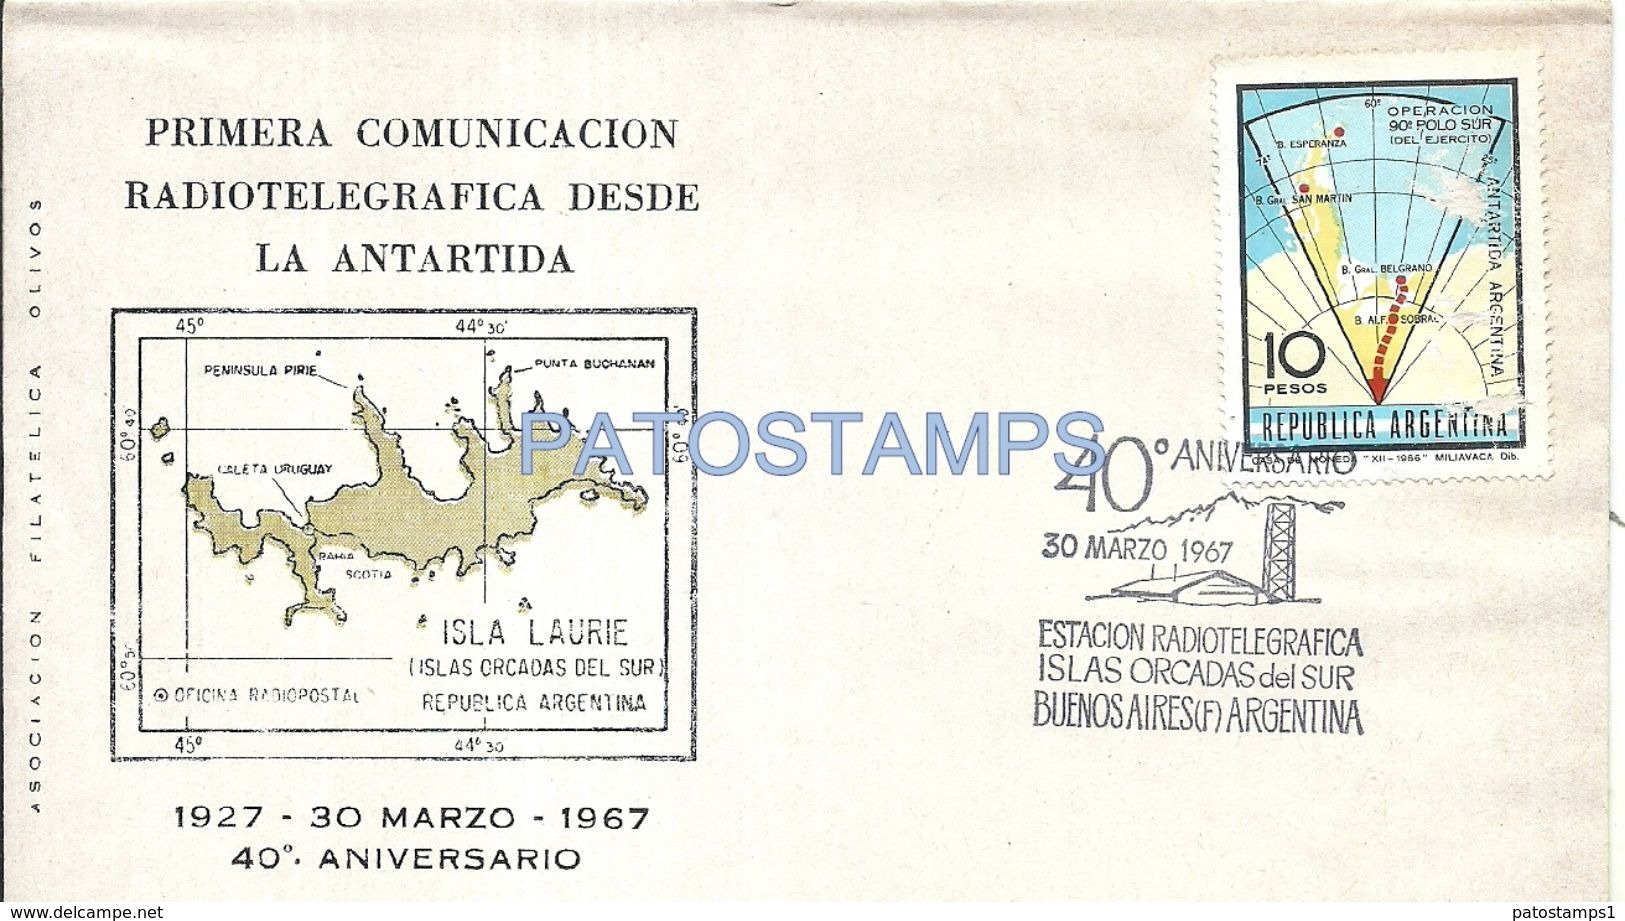 79664 ARGENTINA ANTARTIDA ANTARCTICA COVER 40º ANIVERSARIO 1º COMUNICACION RADIOTELEGRAFICA NO POSTCARD - Argentinien